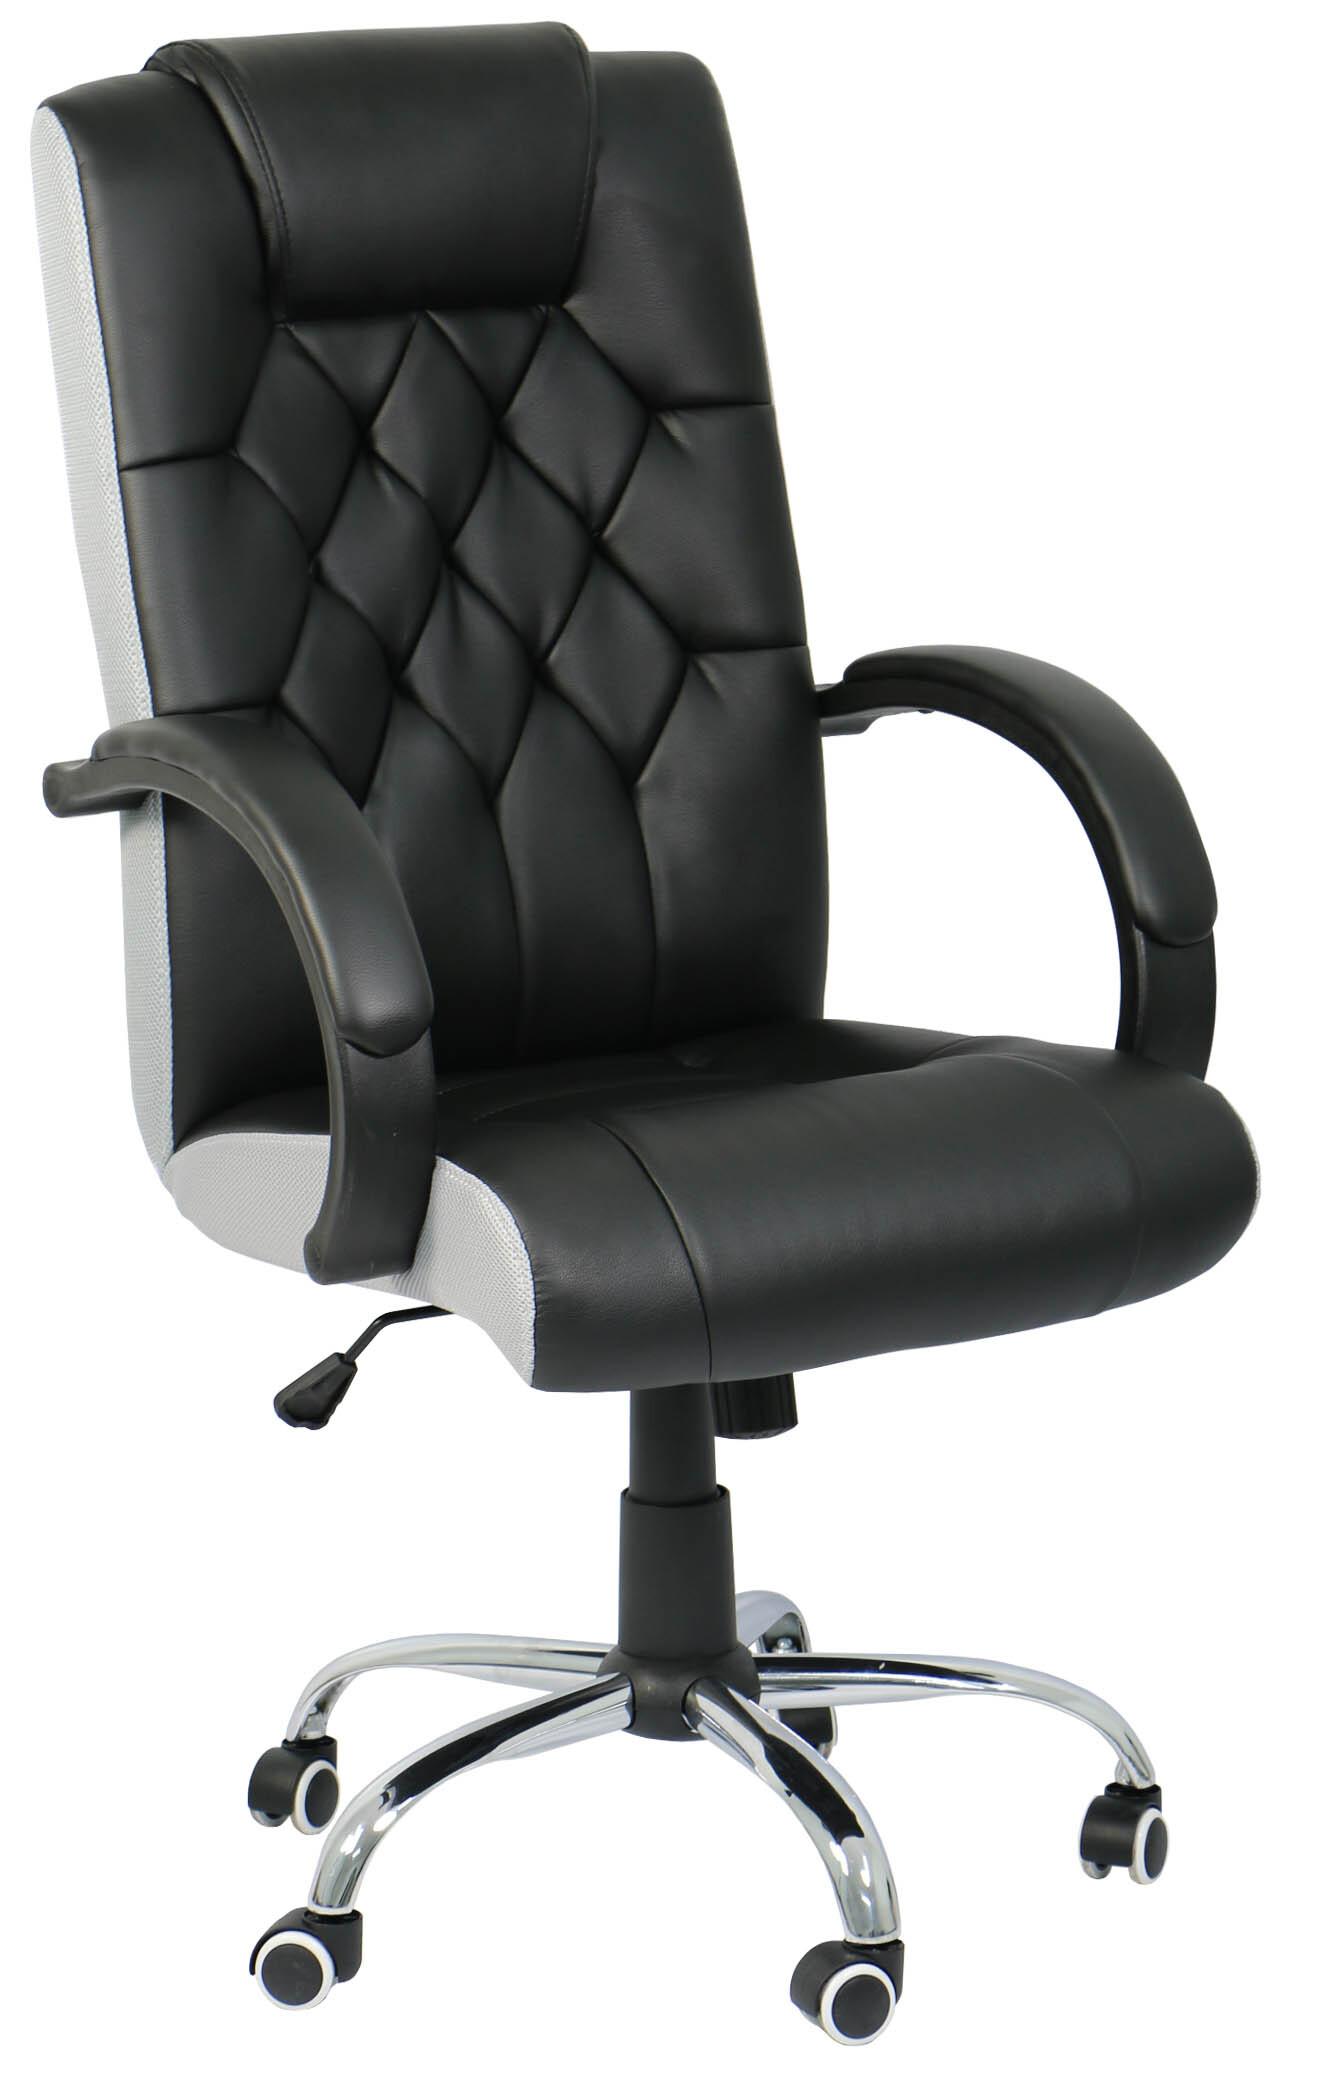 rockford executive office chair black furniture home dacor